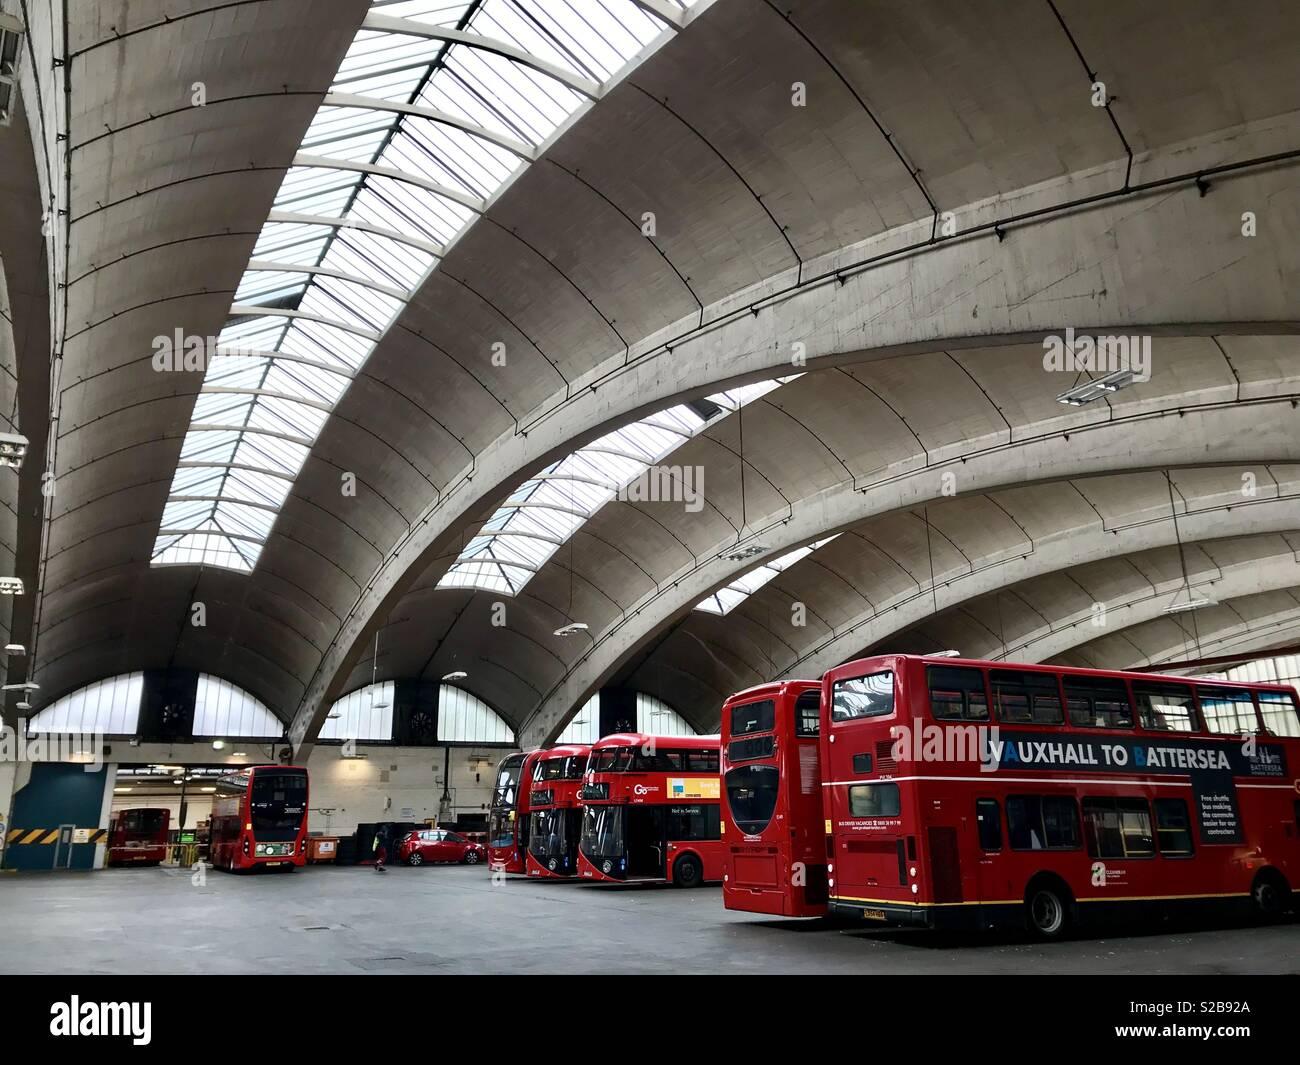 Stockwell Bus Garage - Stock Image